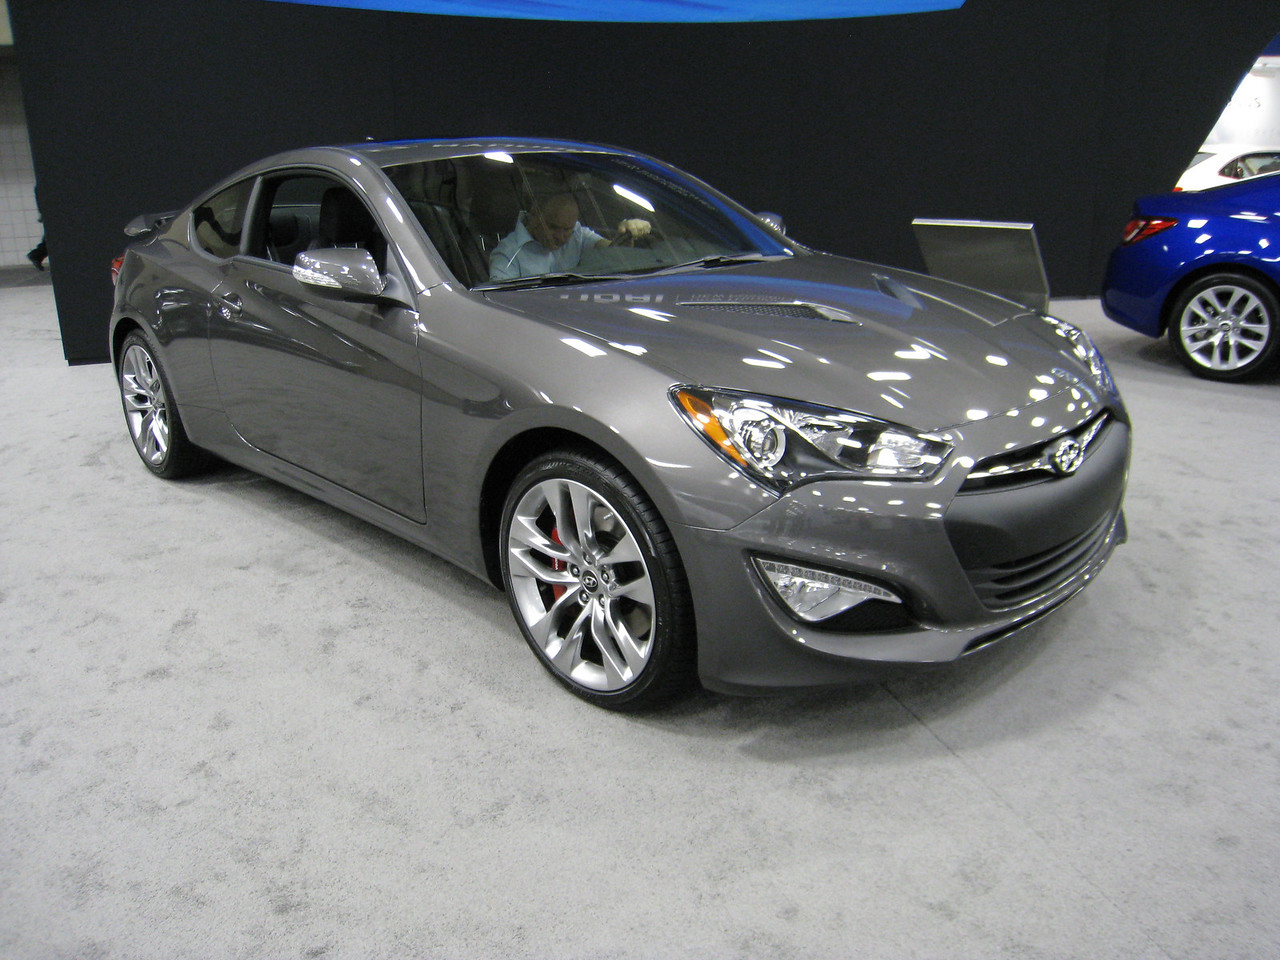 2013 Hyundai Genesis Coupe V-6 - 348 horsepower!